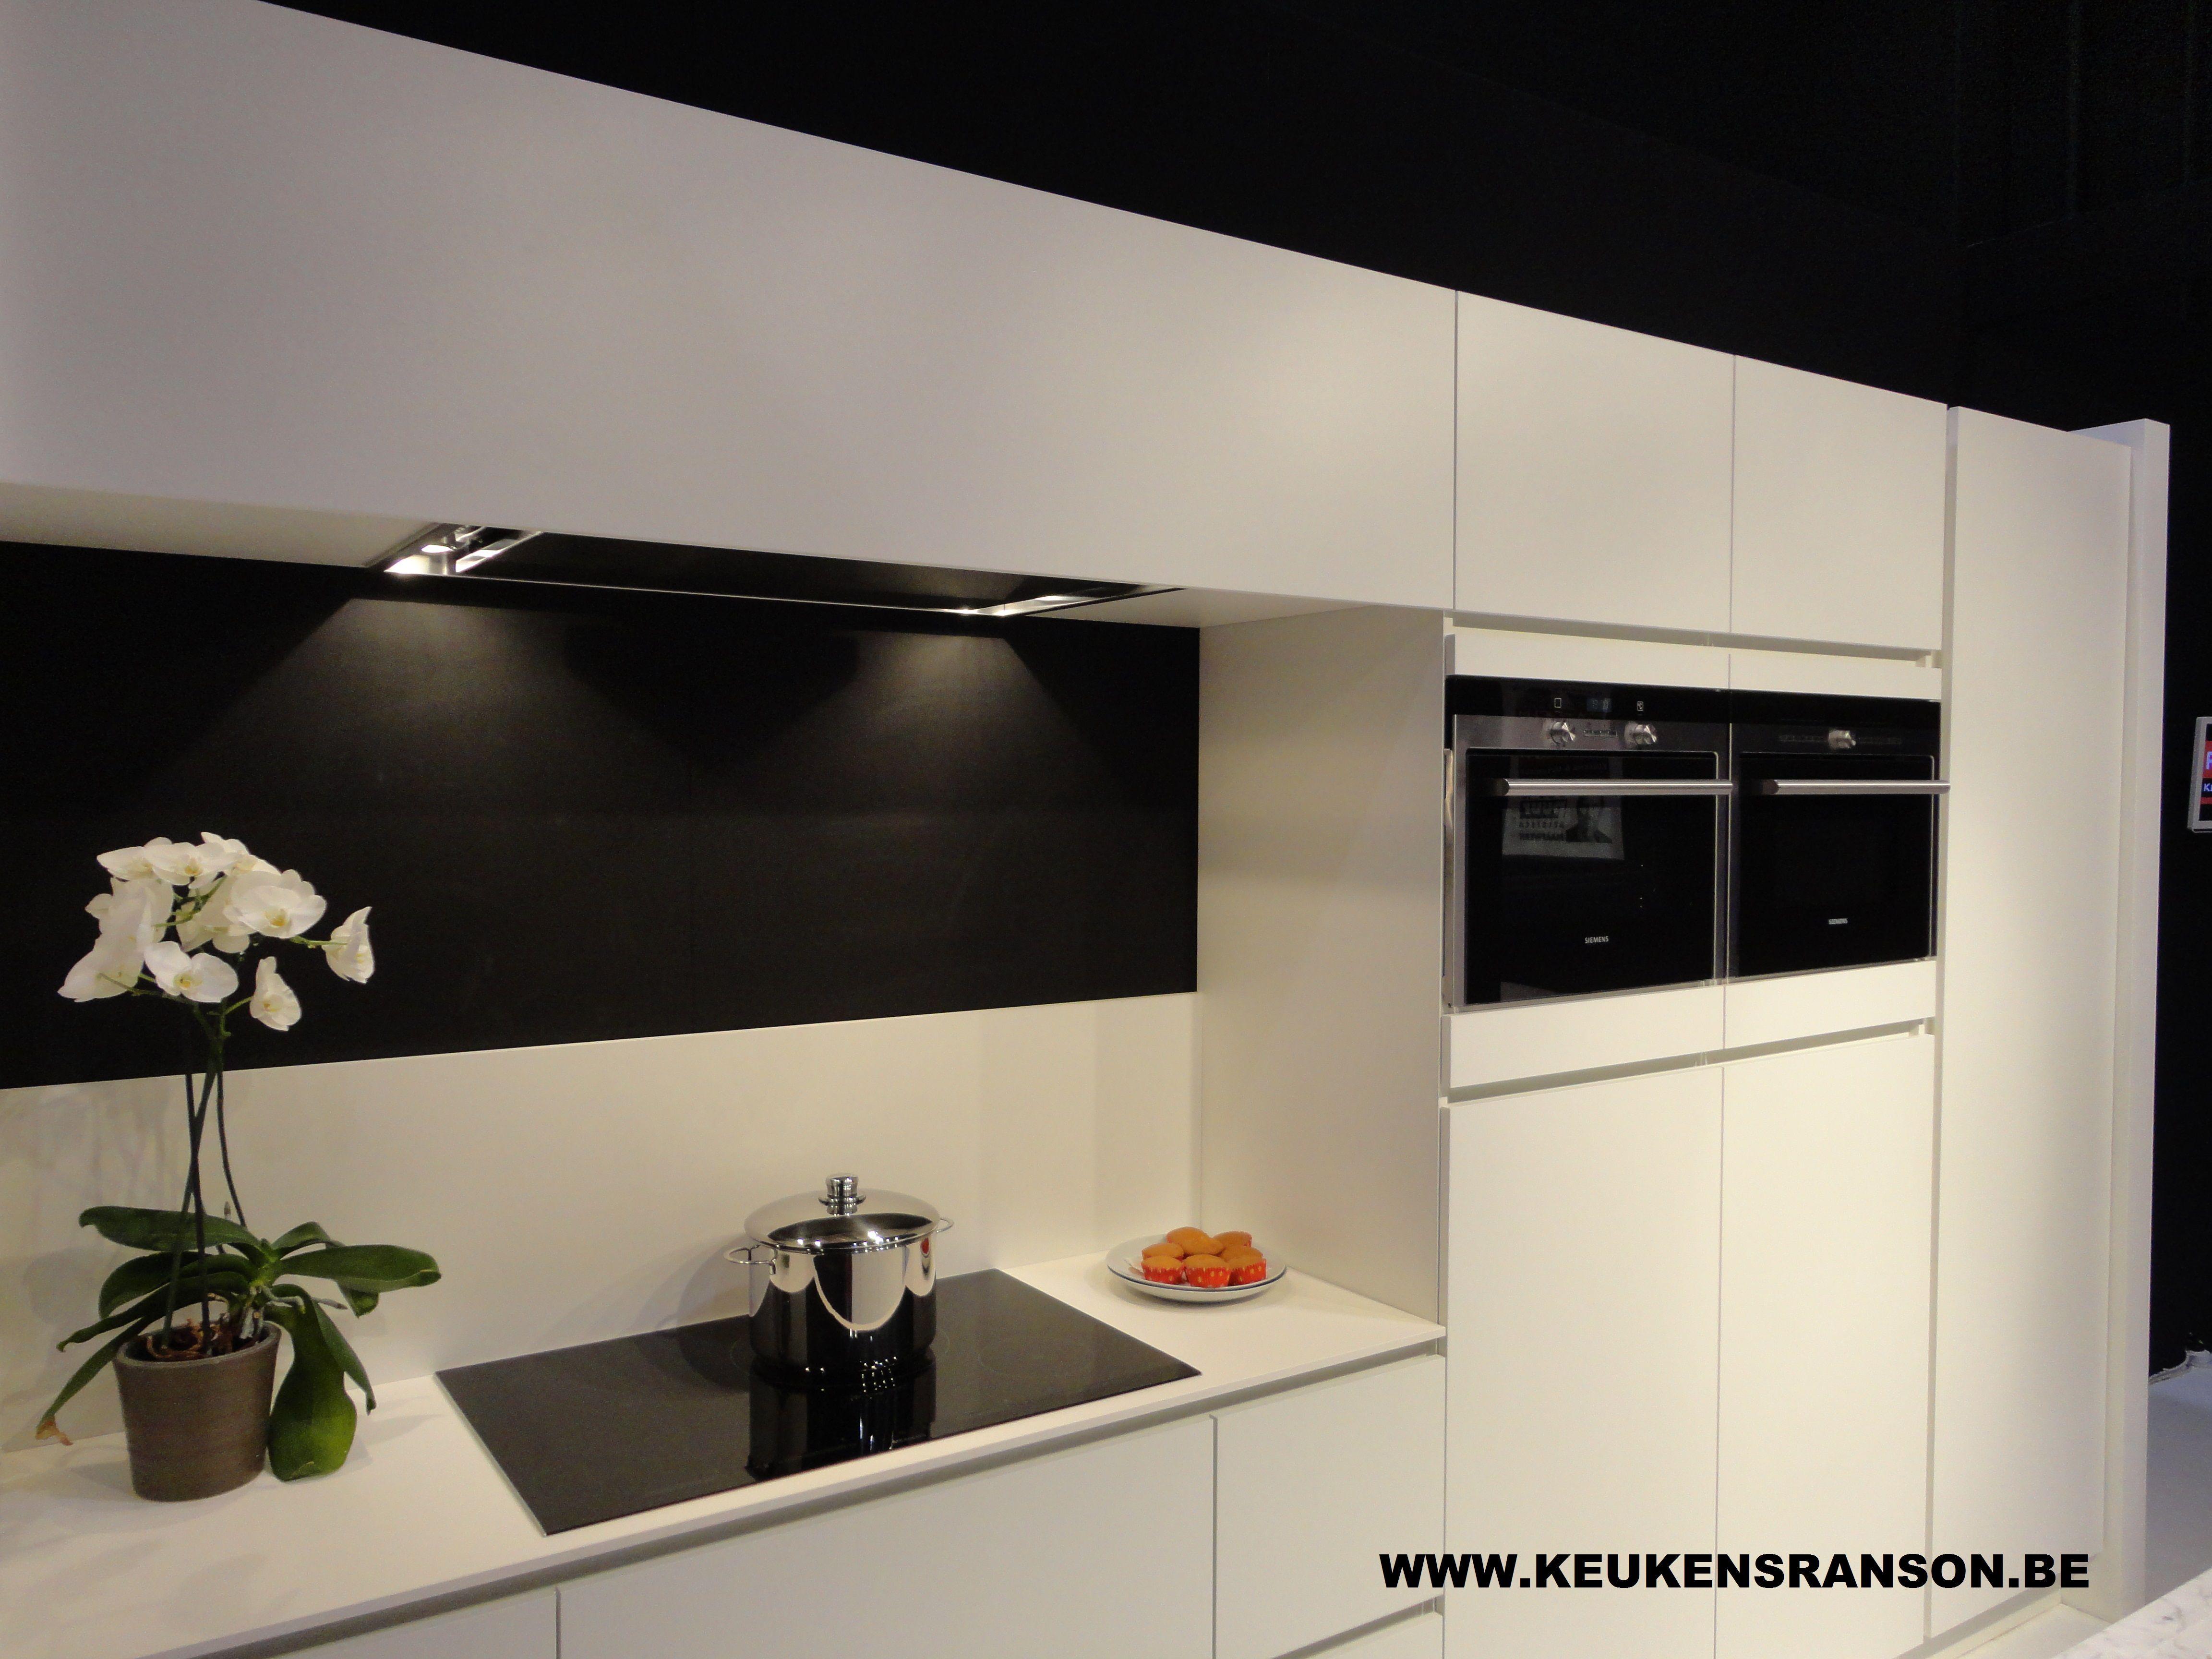 Witte Laminaat Keuken : Strakke greeploze keuken wit laminaat ideeën voor keukens by